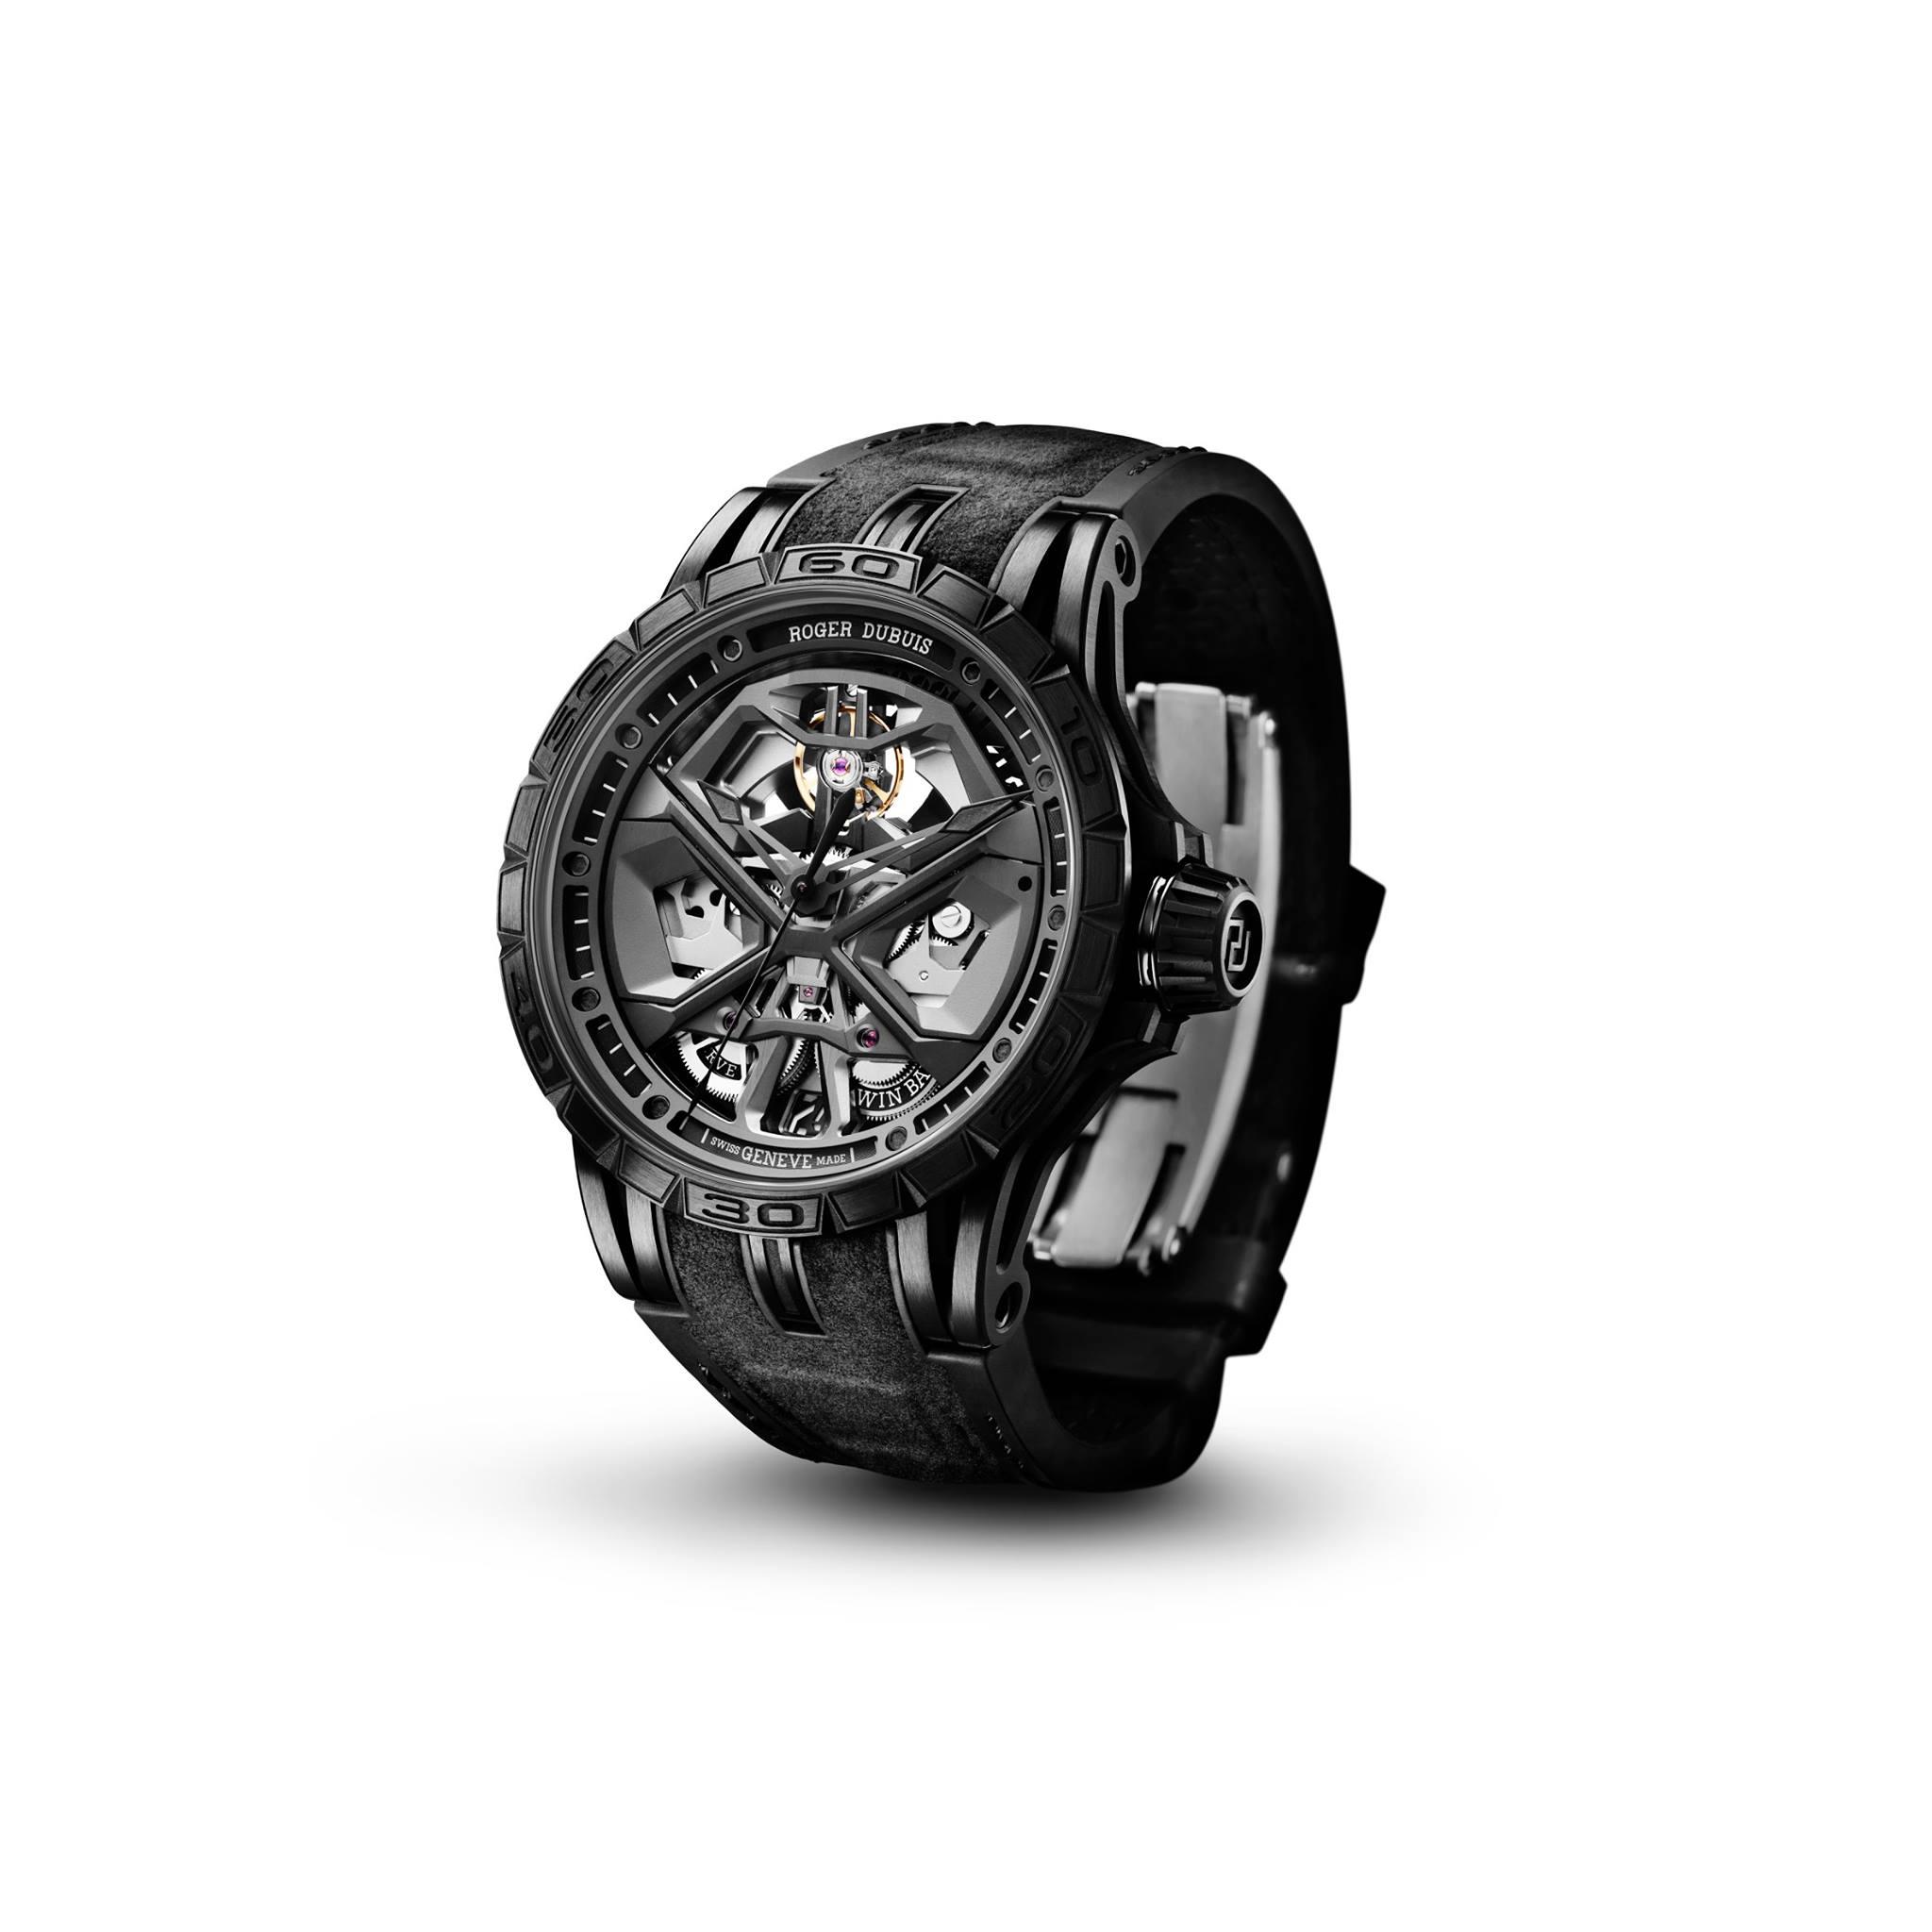 Roger Dubuis Excalibur Total Black 2020-2